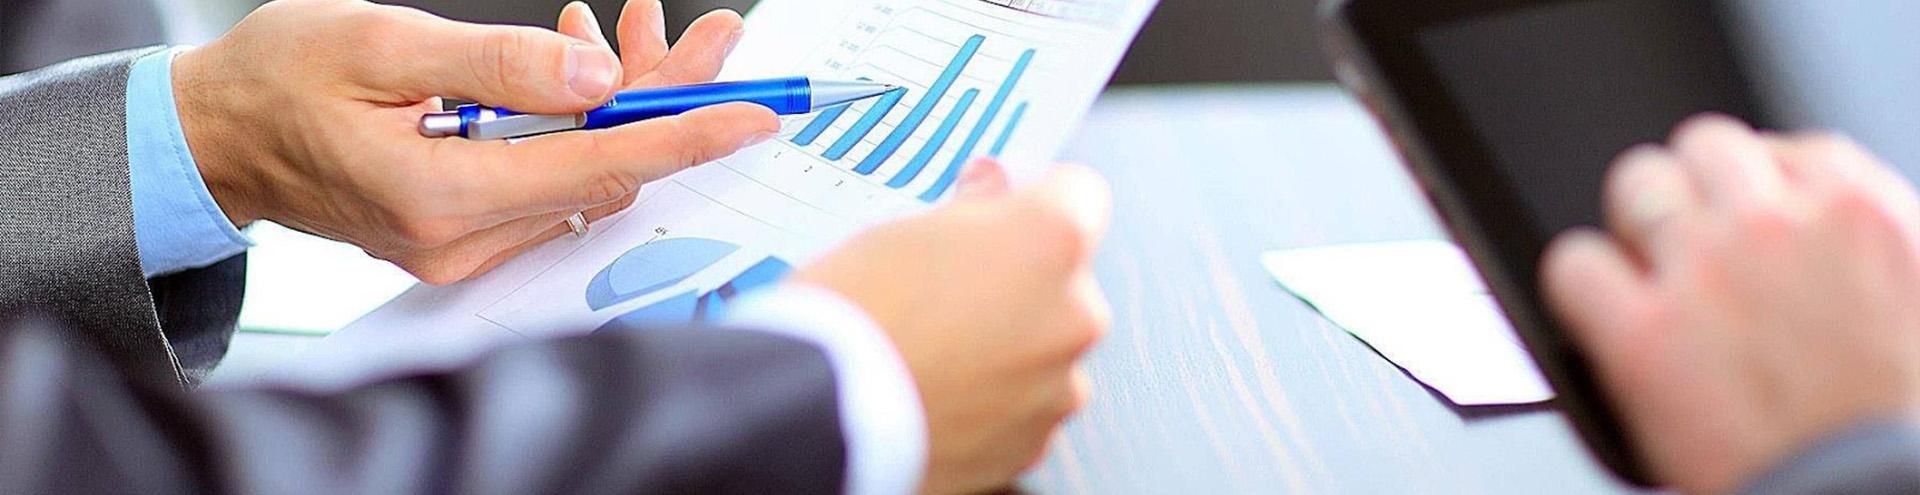 Расчет зарплаты по дням онлайн калькулятор